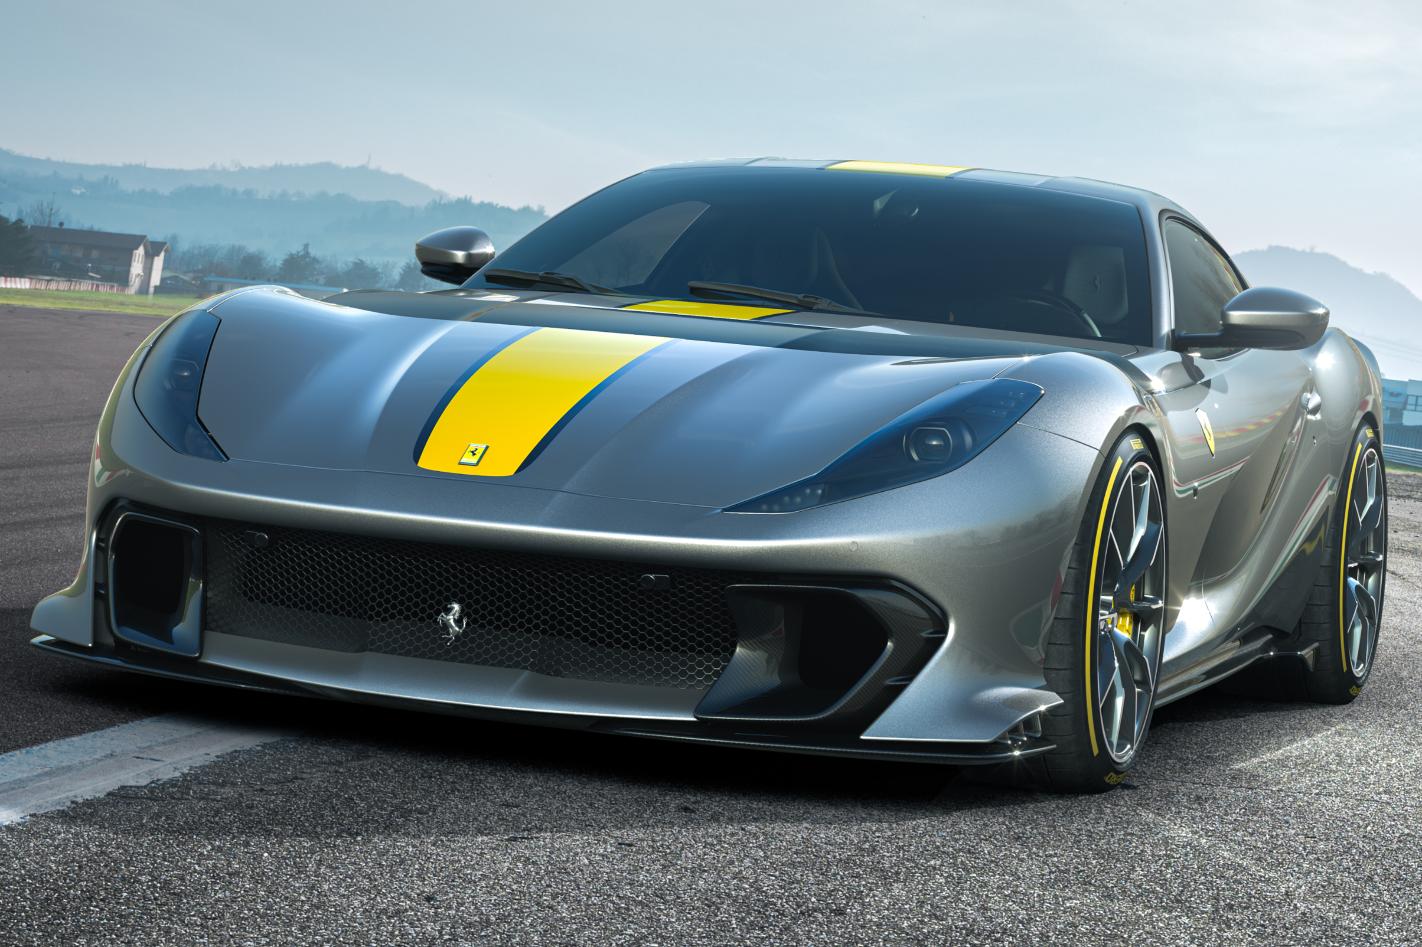 2021 Ferrari 812 Superfast Special Series 3 Png